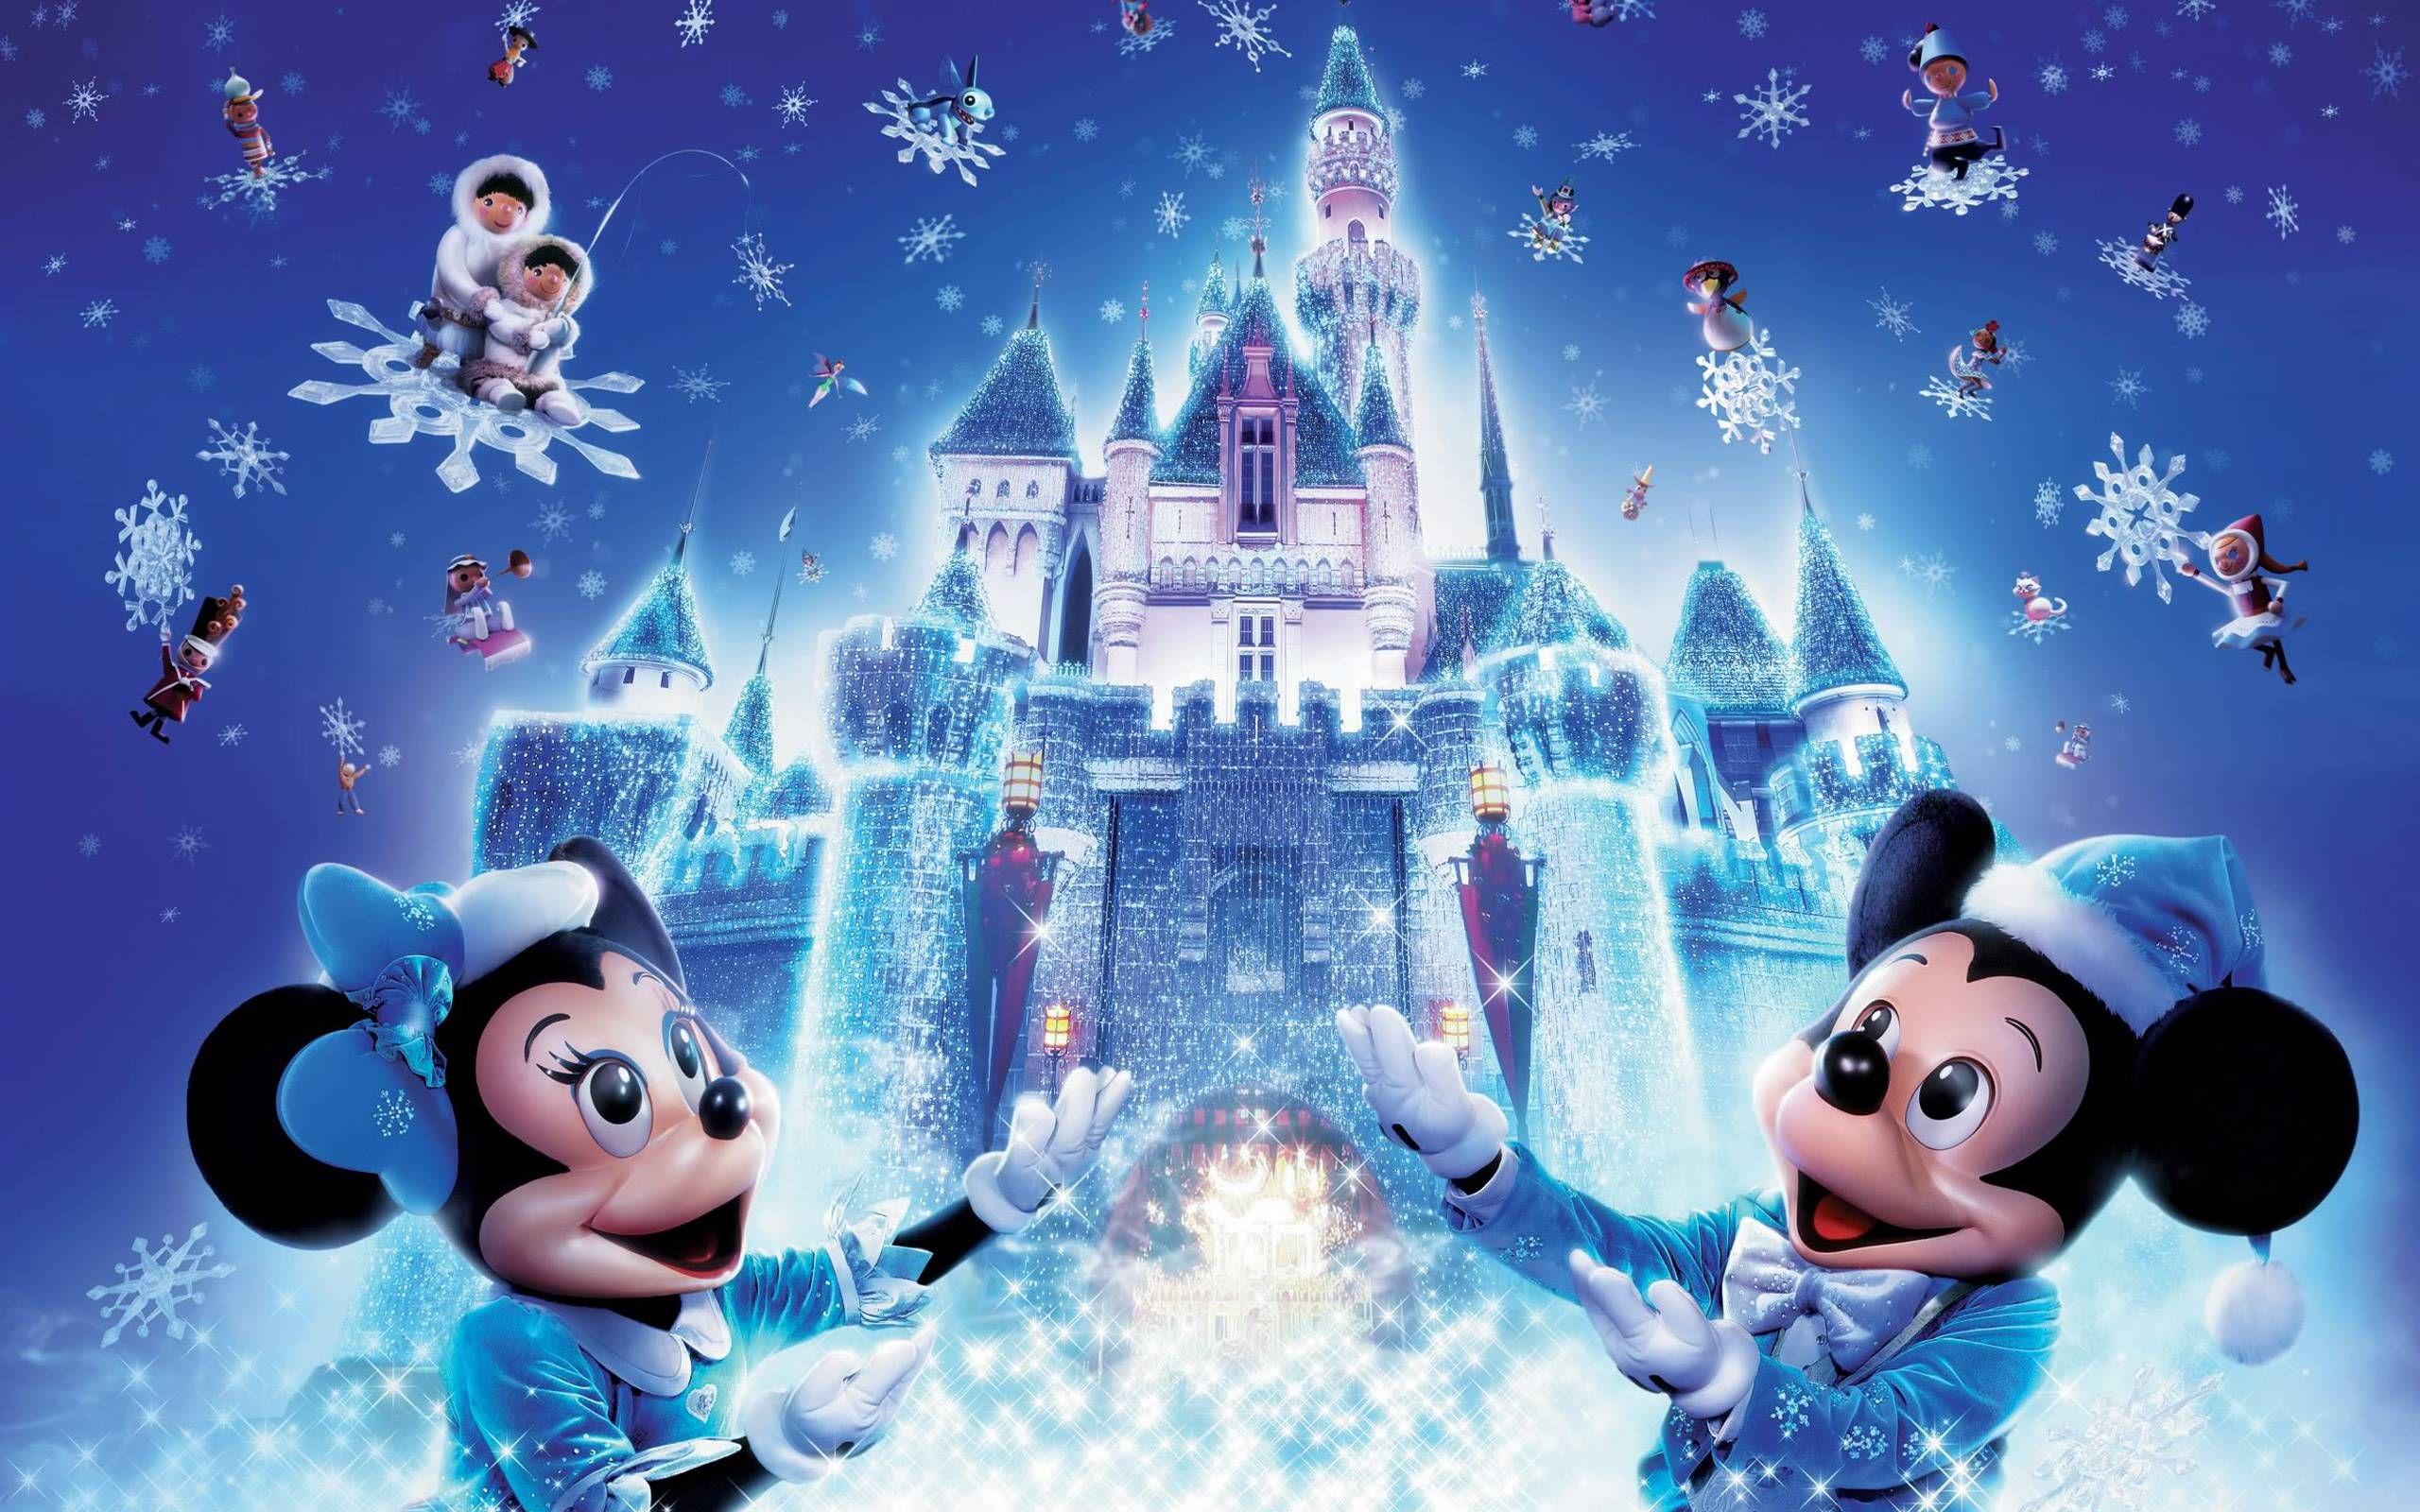 Free Disney Desktop Wallpaper Backgrounds Wallpaper Cave Disneyland Christmas Animated Christmas Wallpaper Disney Wallpaper